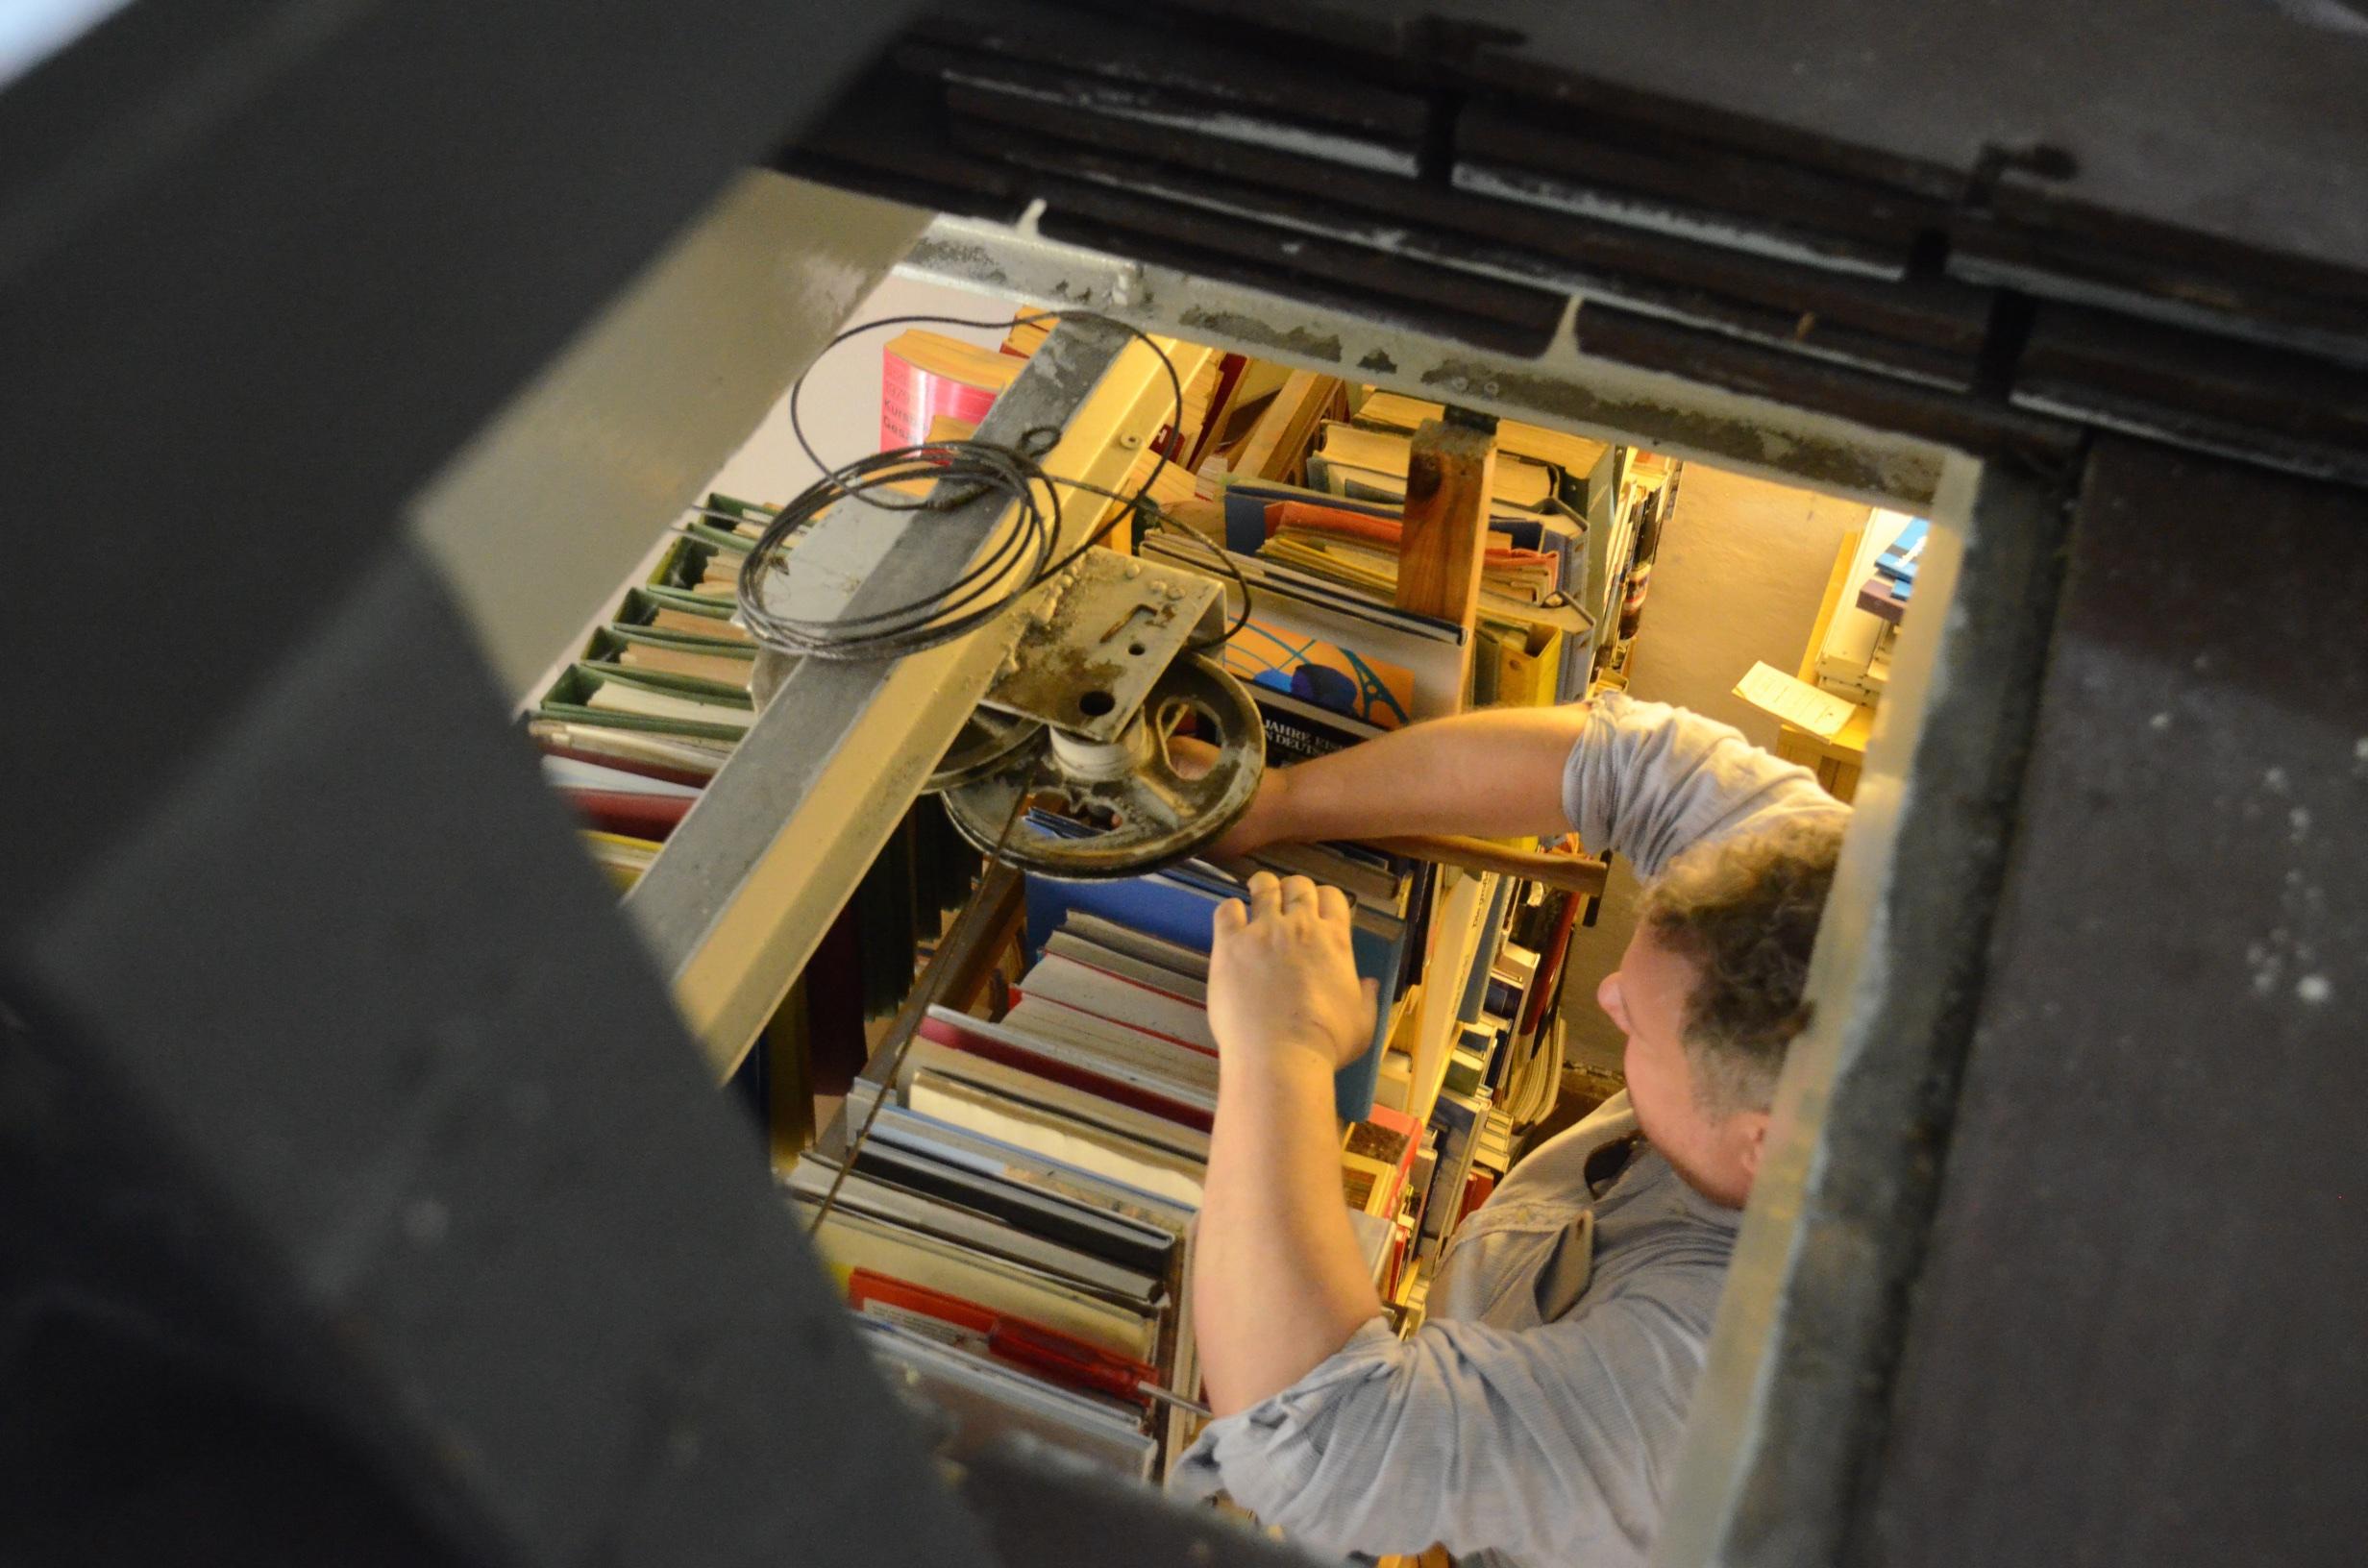 Umbau der Umlenkrolle des Signalstelldrahtes